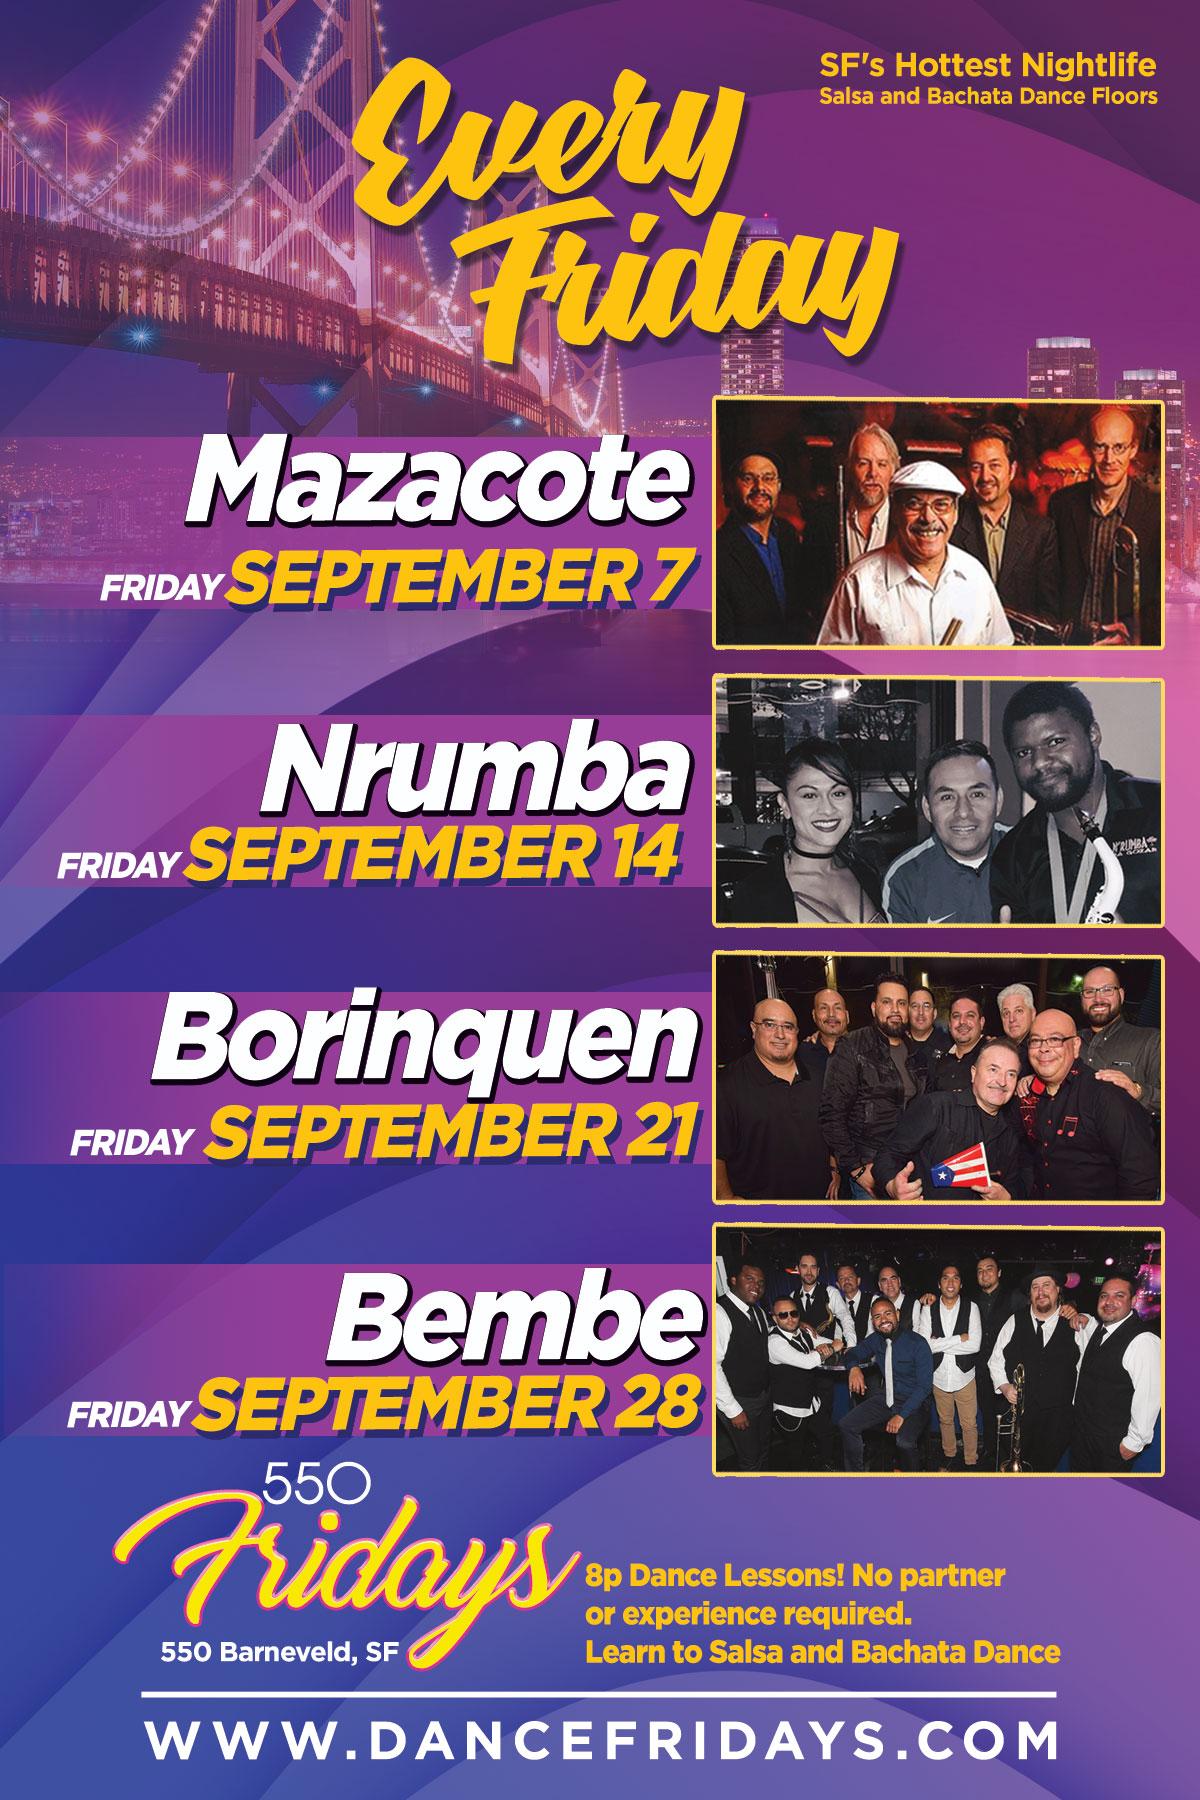 Dance Fridays, 550 Barneveld, SF, 21+